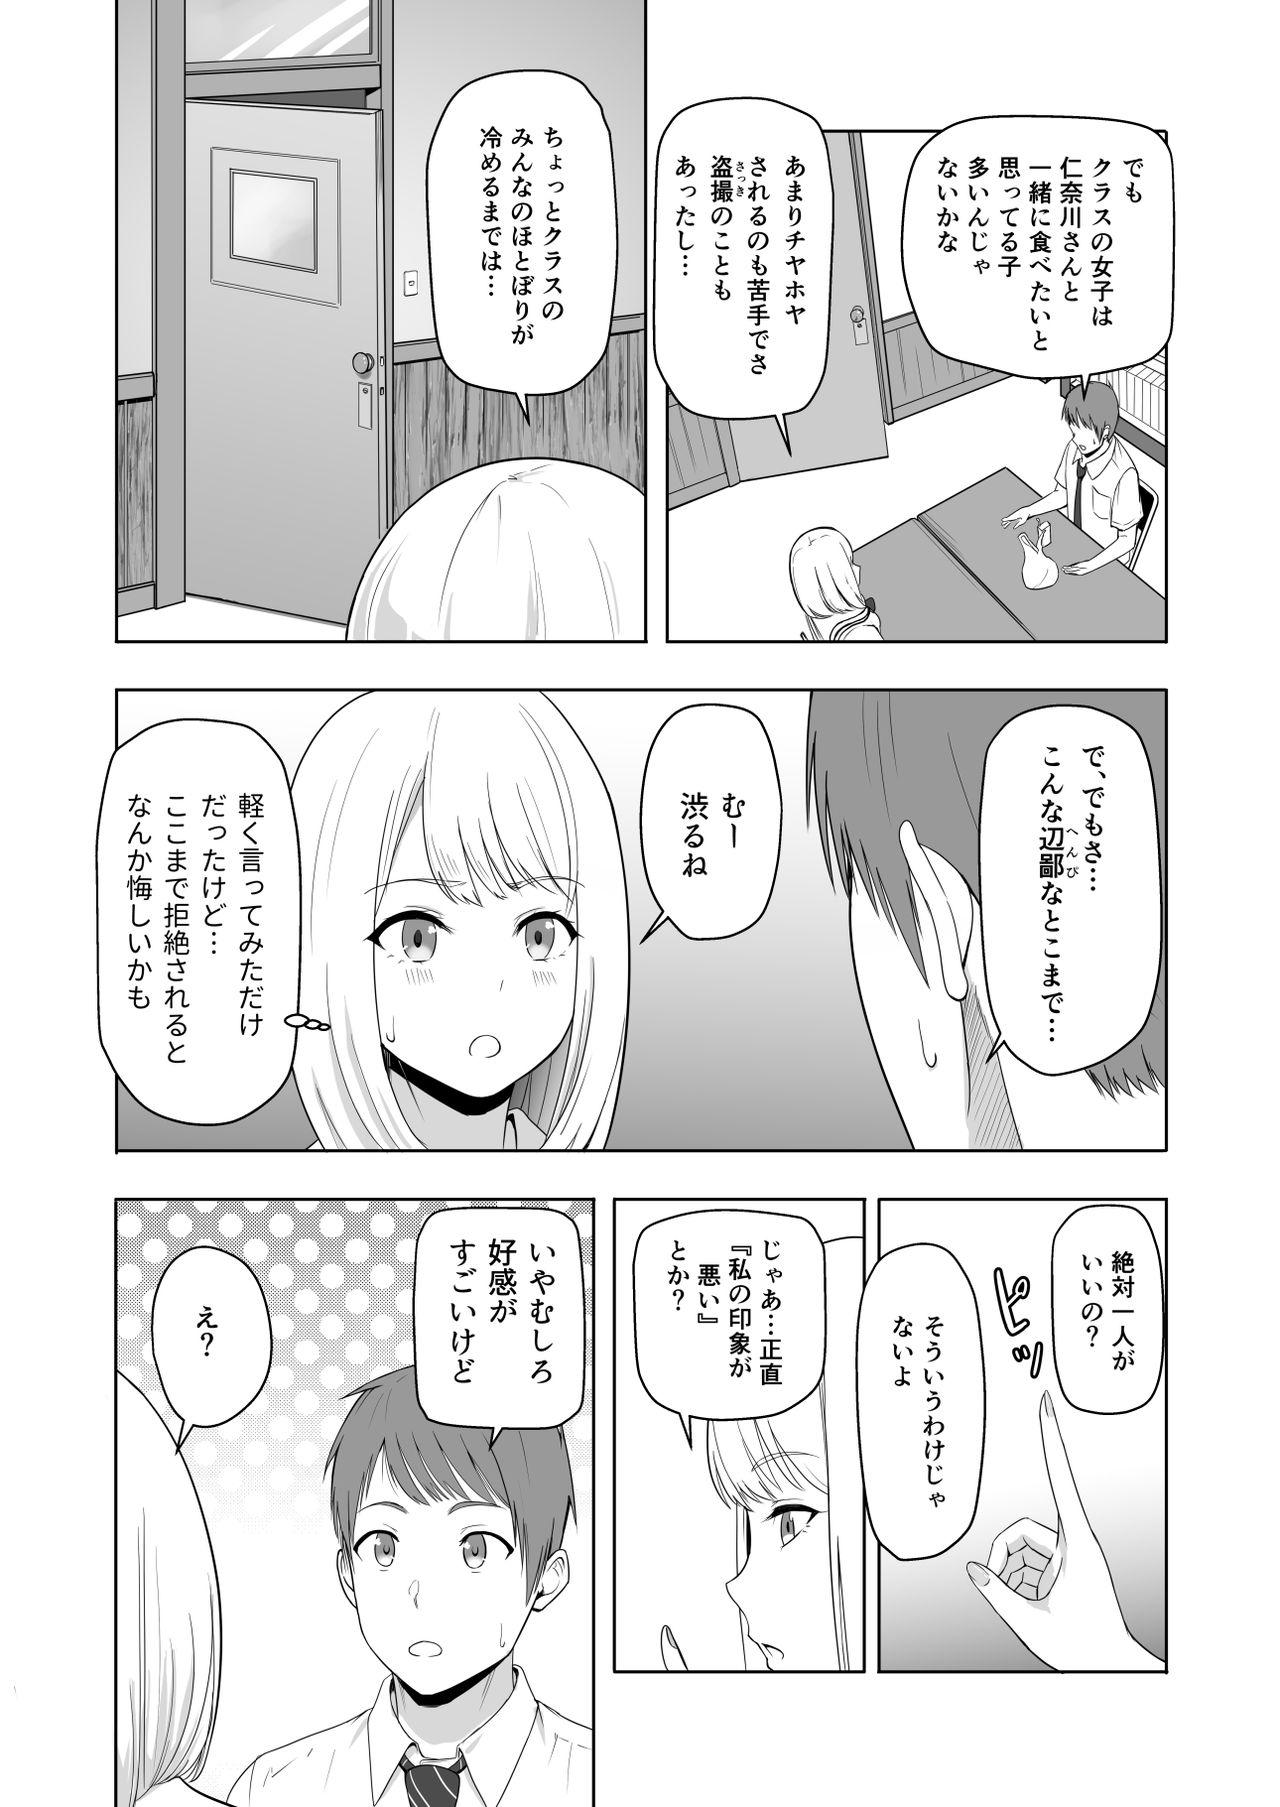 Kimi ga Tame. 2 Ichikawa Inori 22